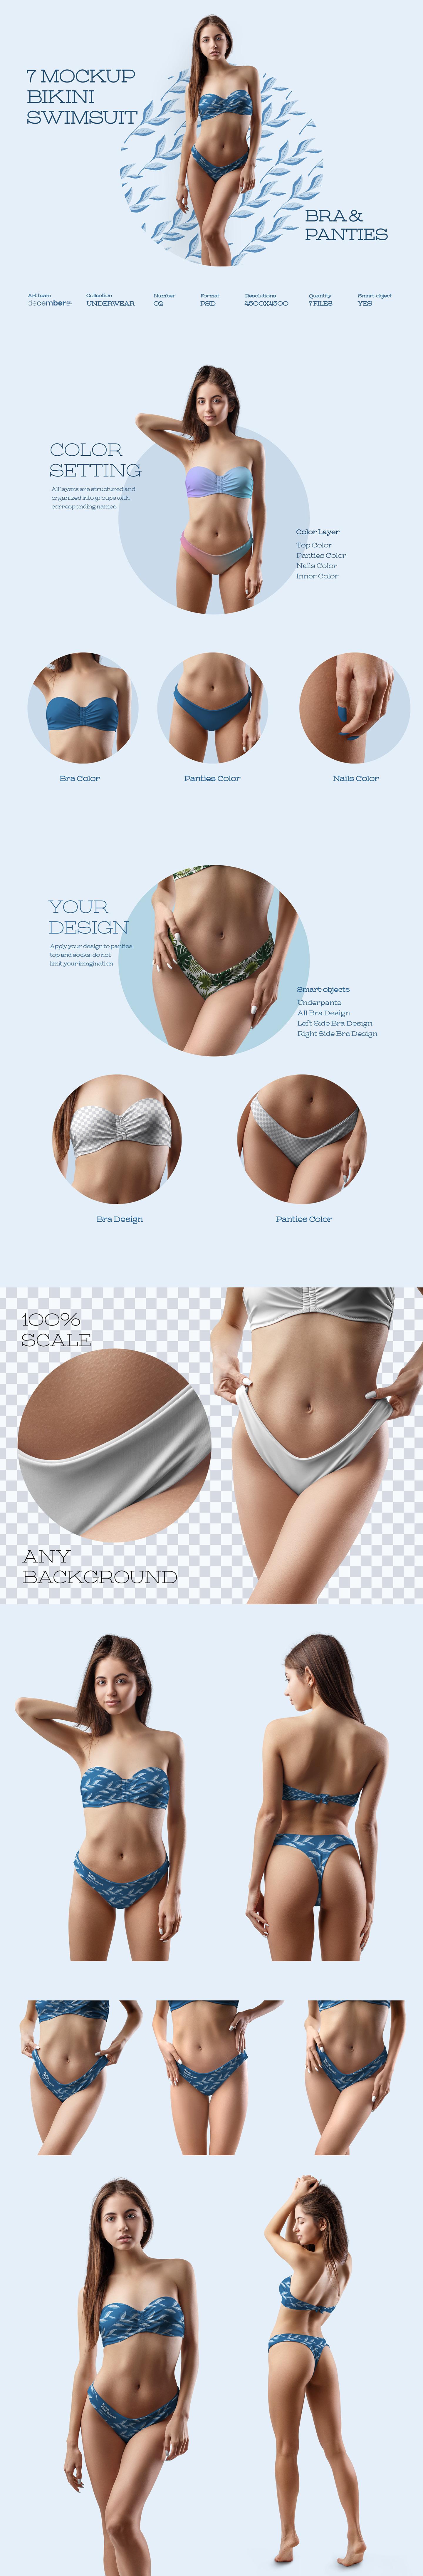 7 Mockups Bikini Swimsuit